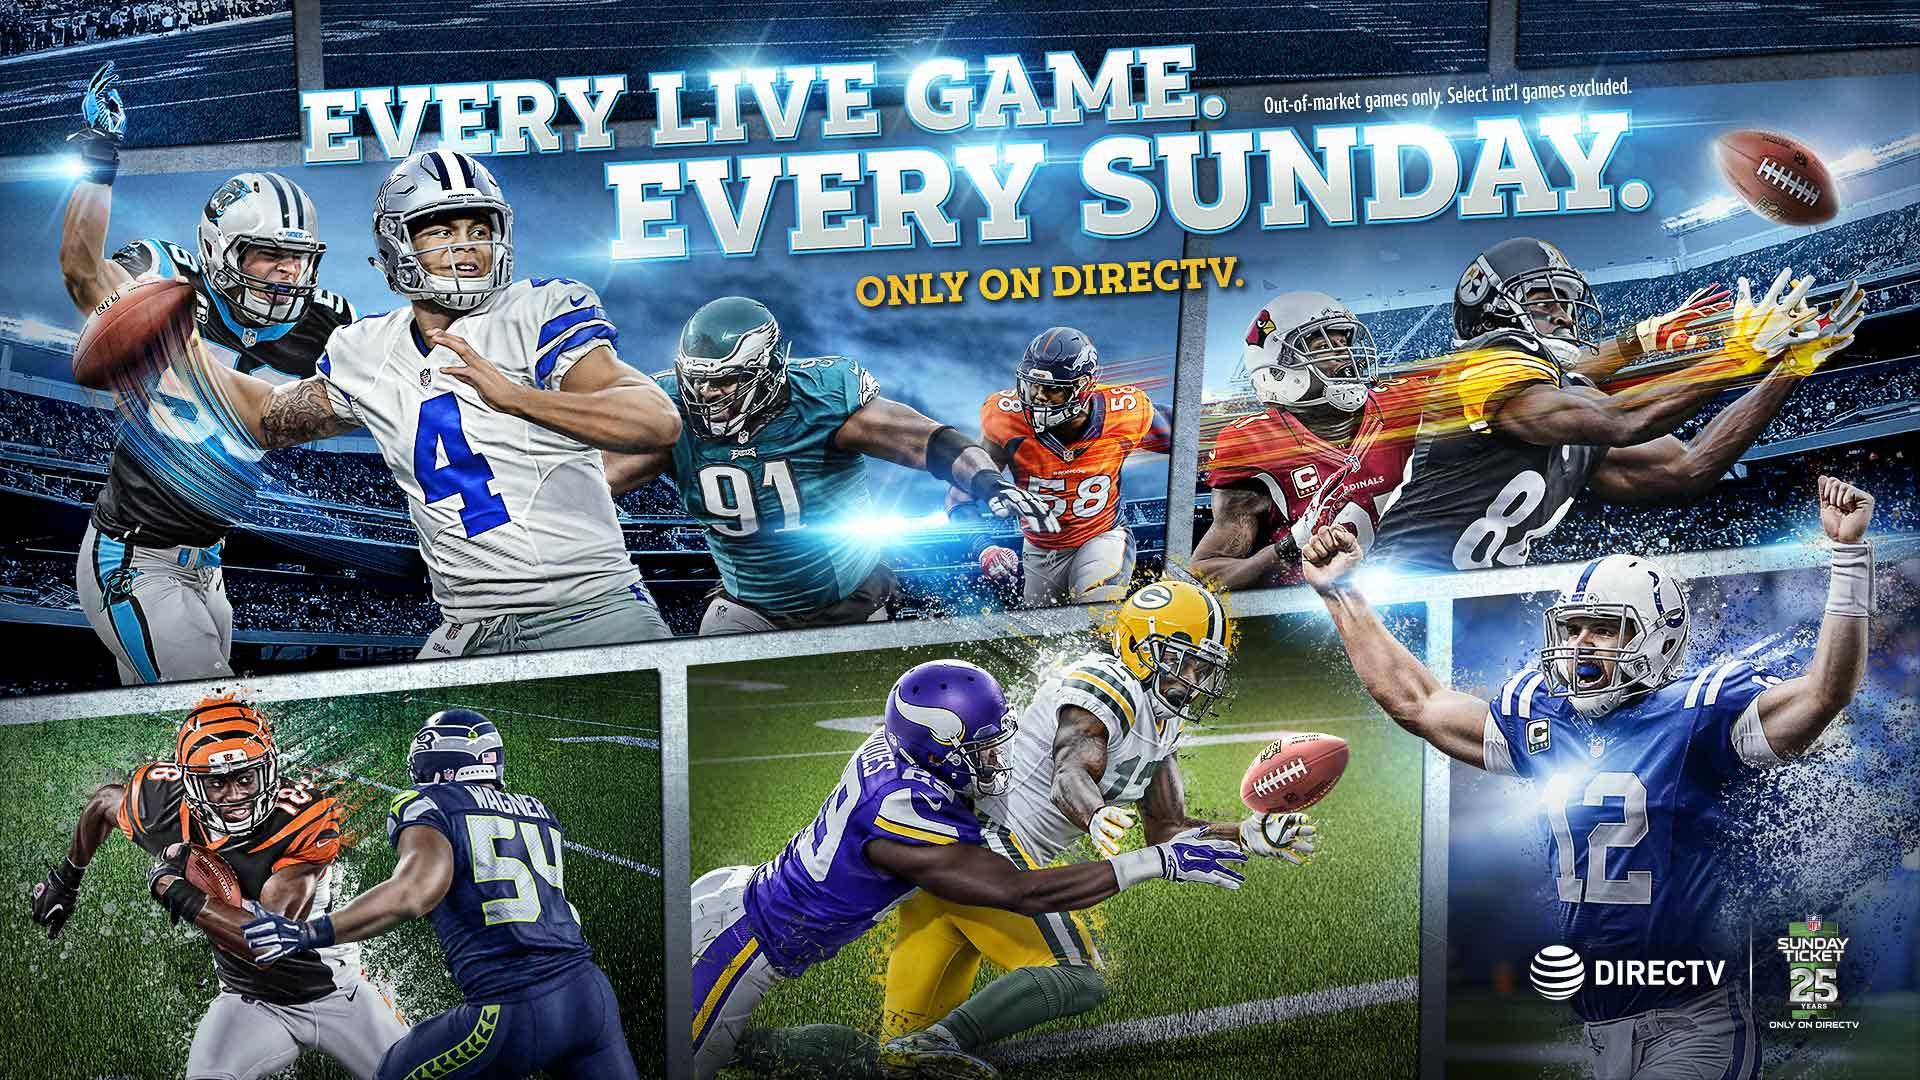 daaf8702e3a Get NFL Sunday Ticket - Microsoft Store